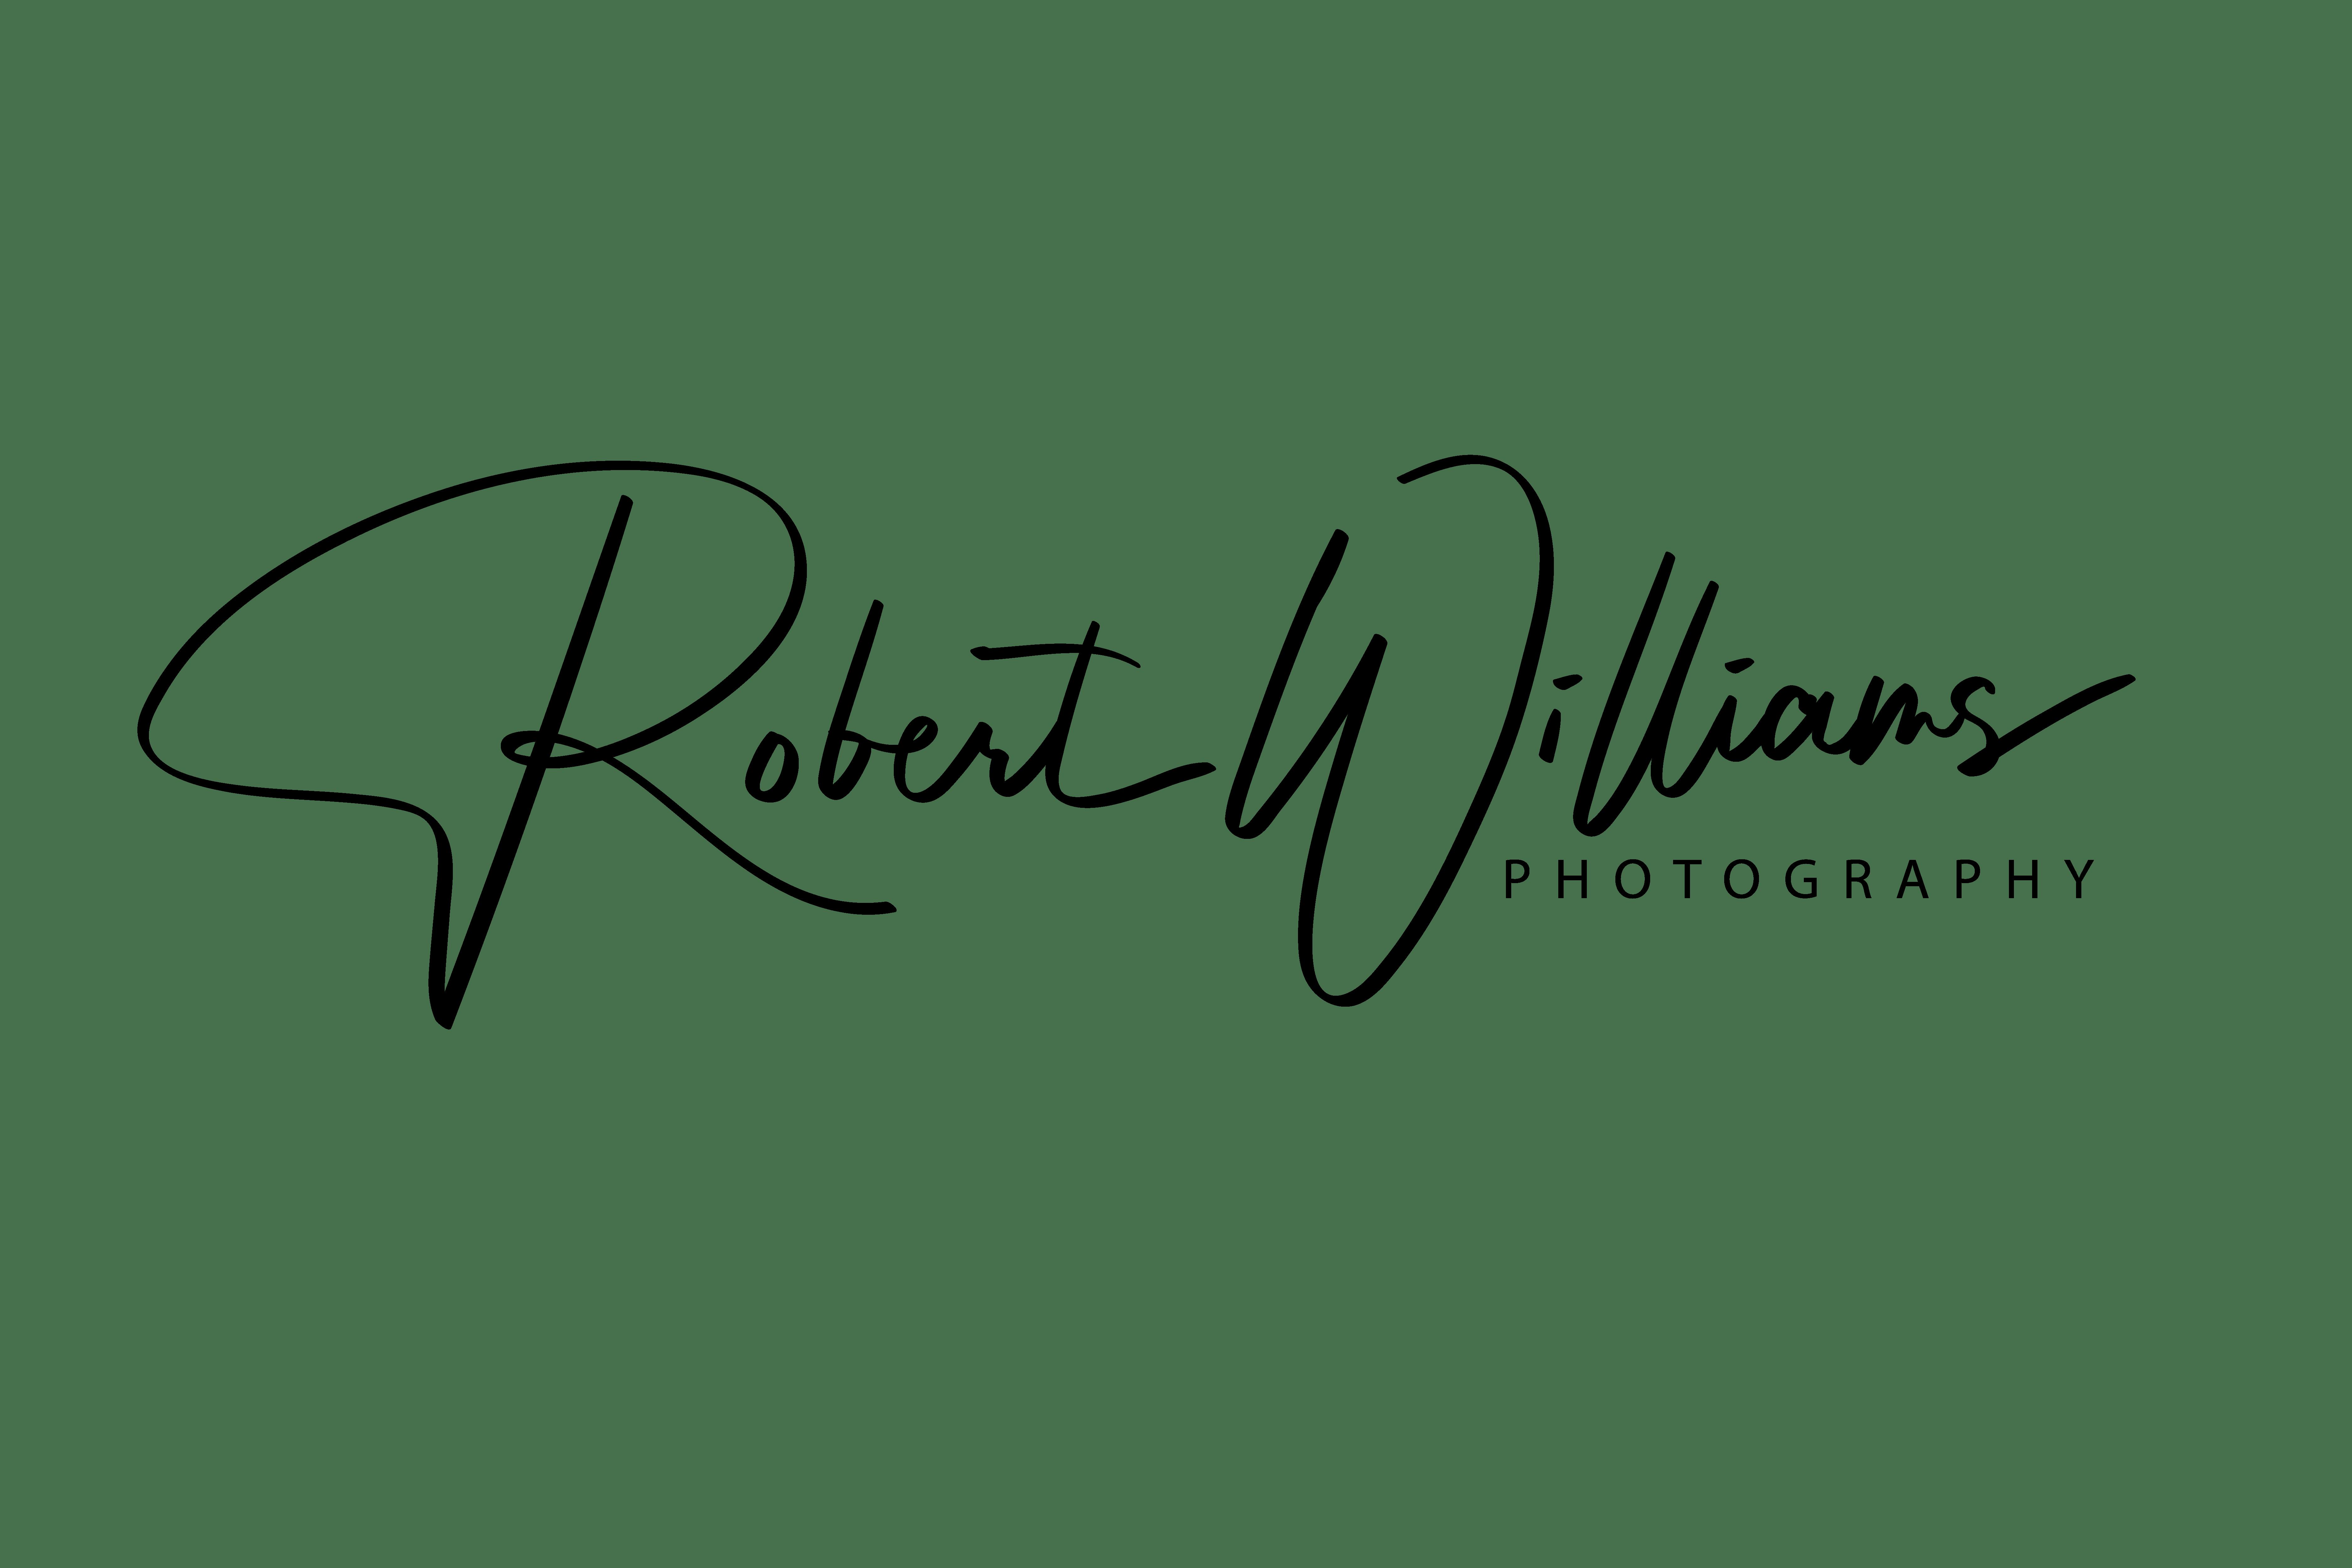 robertwilliams